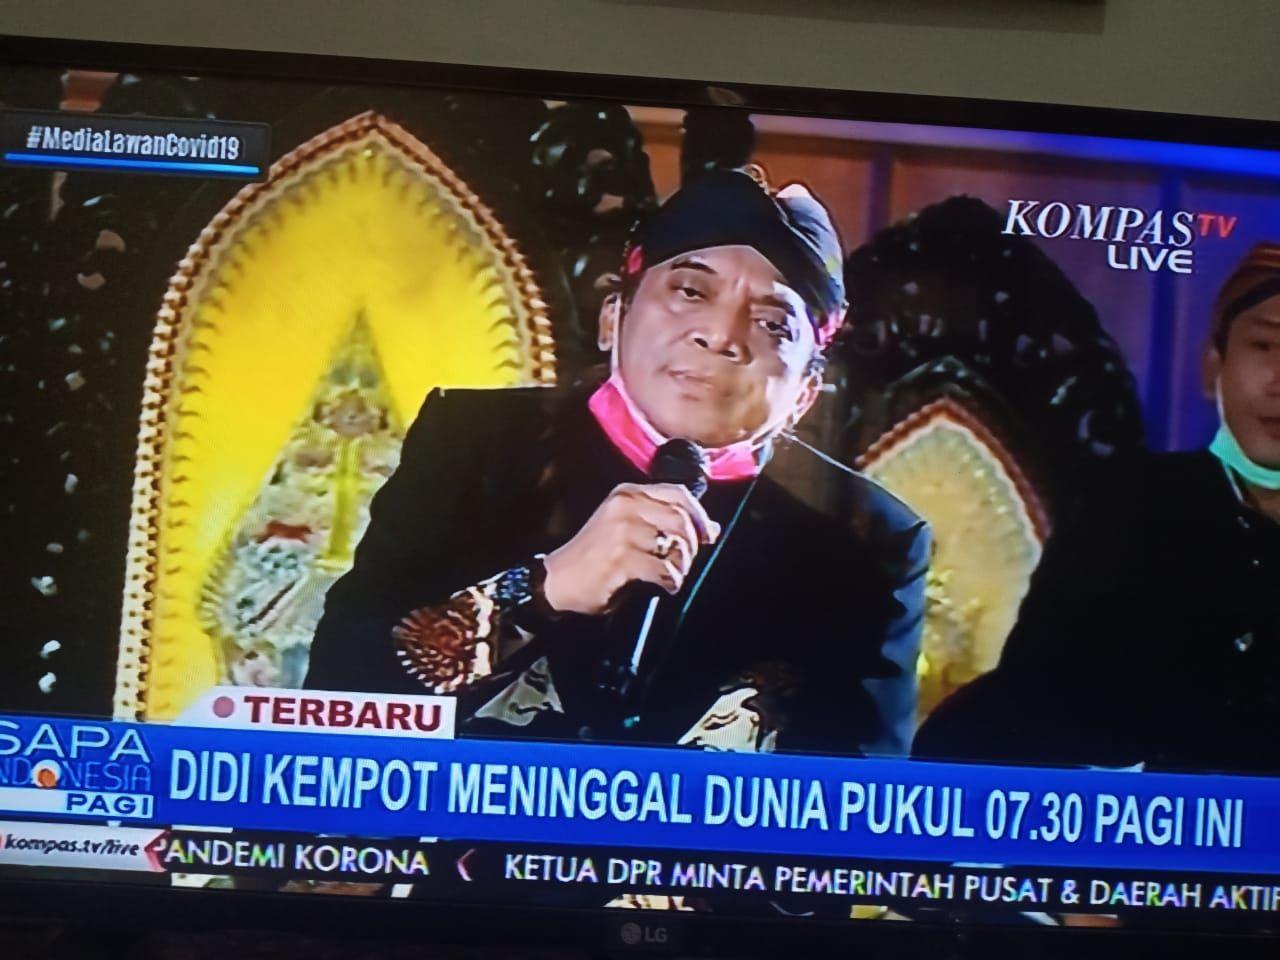 Selamat Jalan Didi Kempot Indonesia Dan Sahabat Ambyar